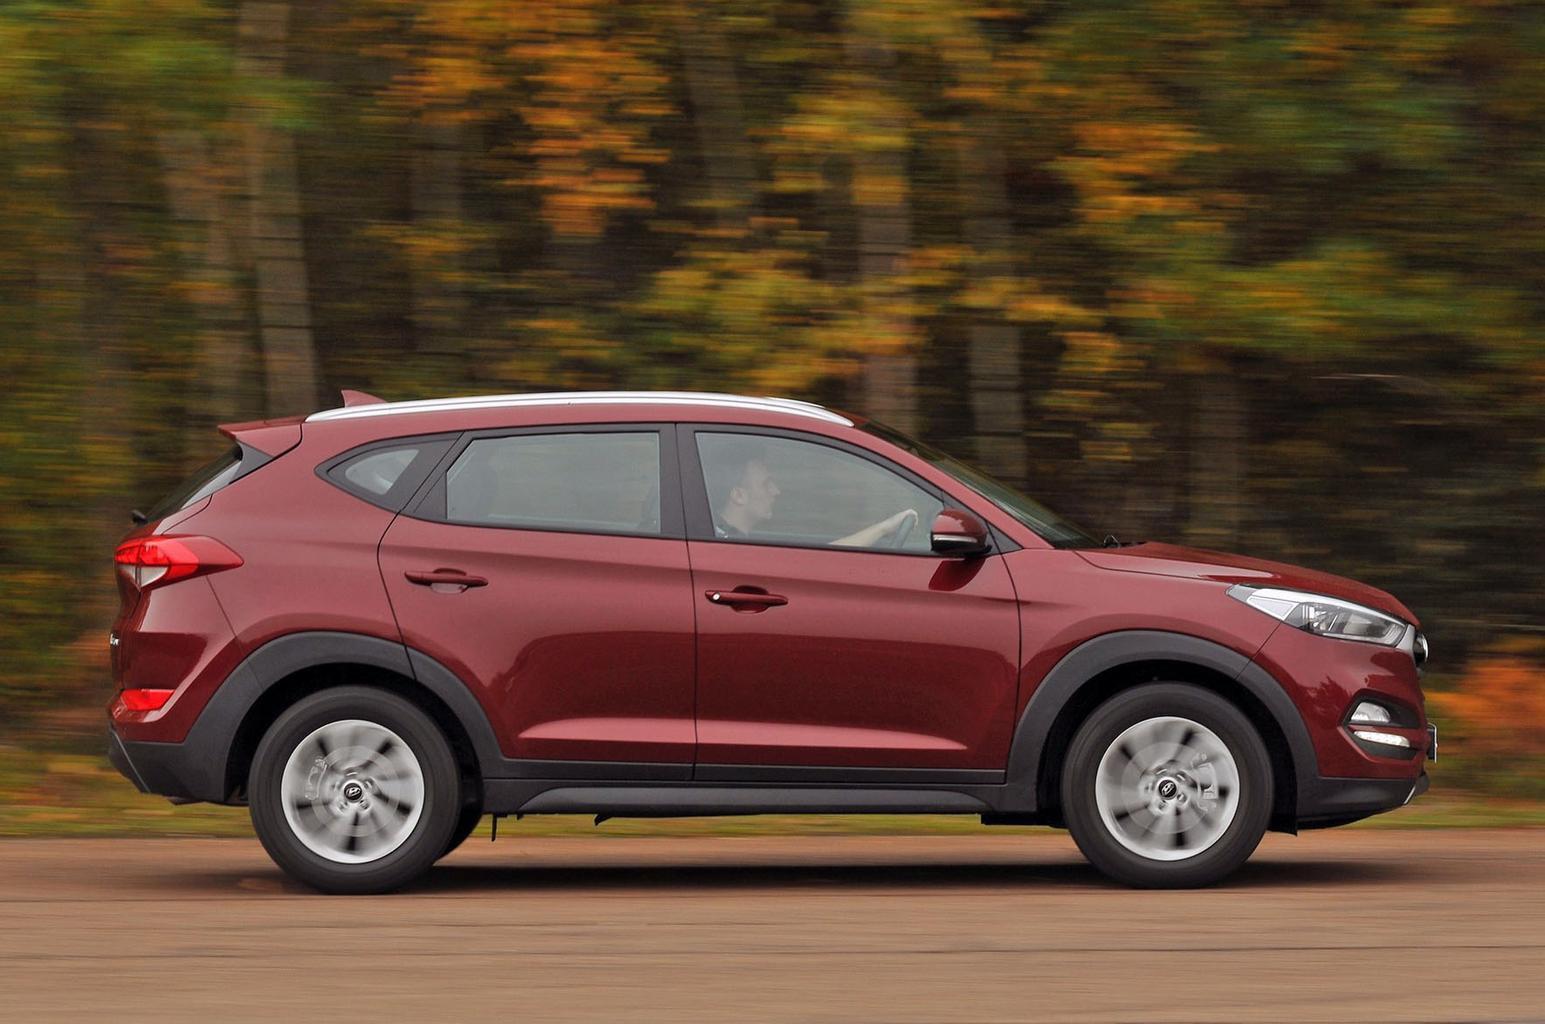 Used Hyundai Tucson (2015-present)